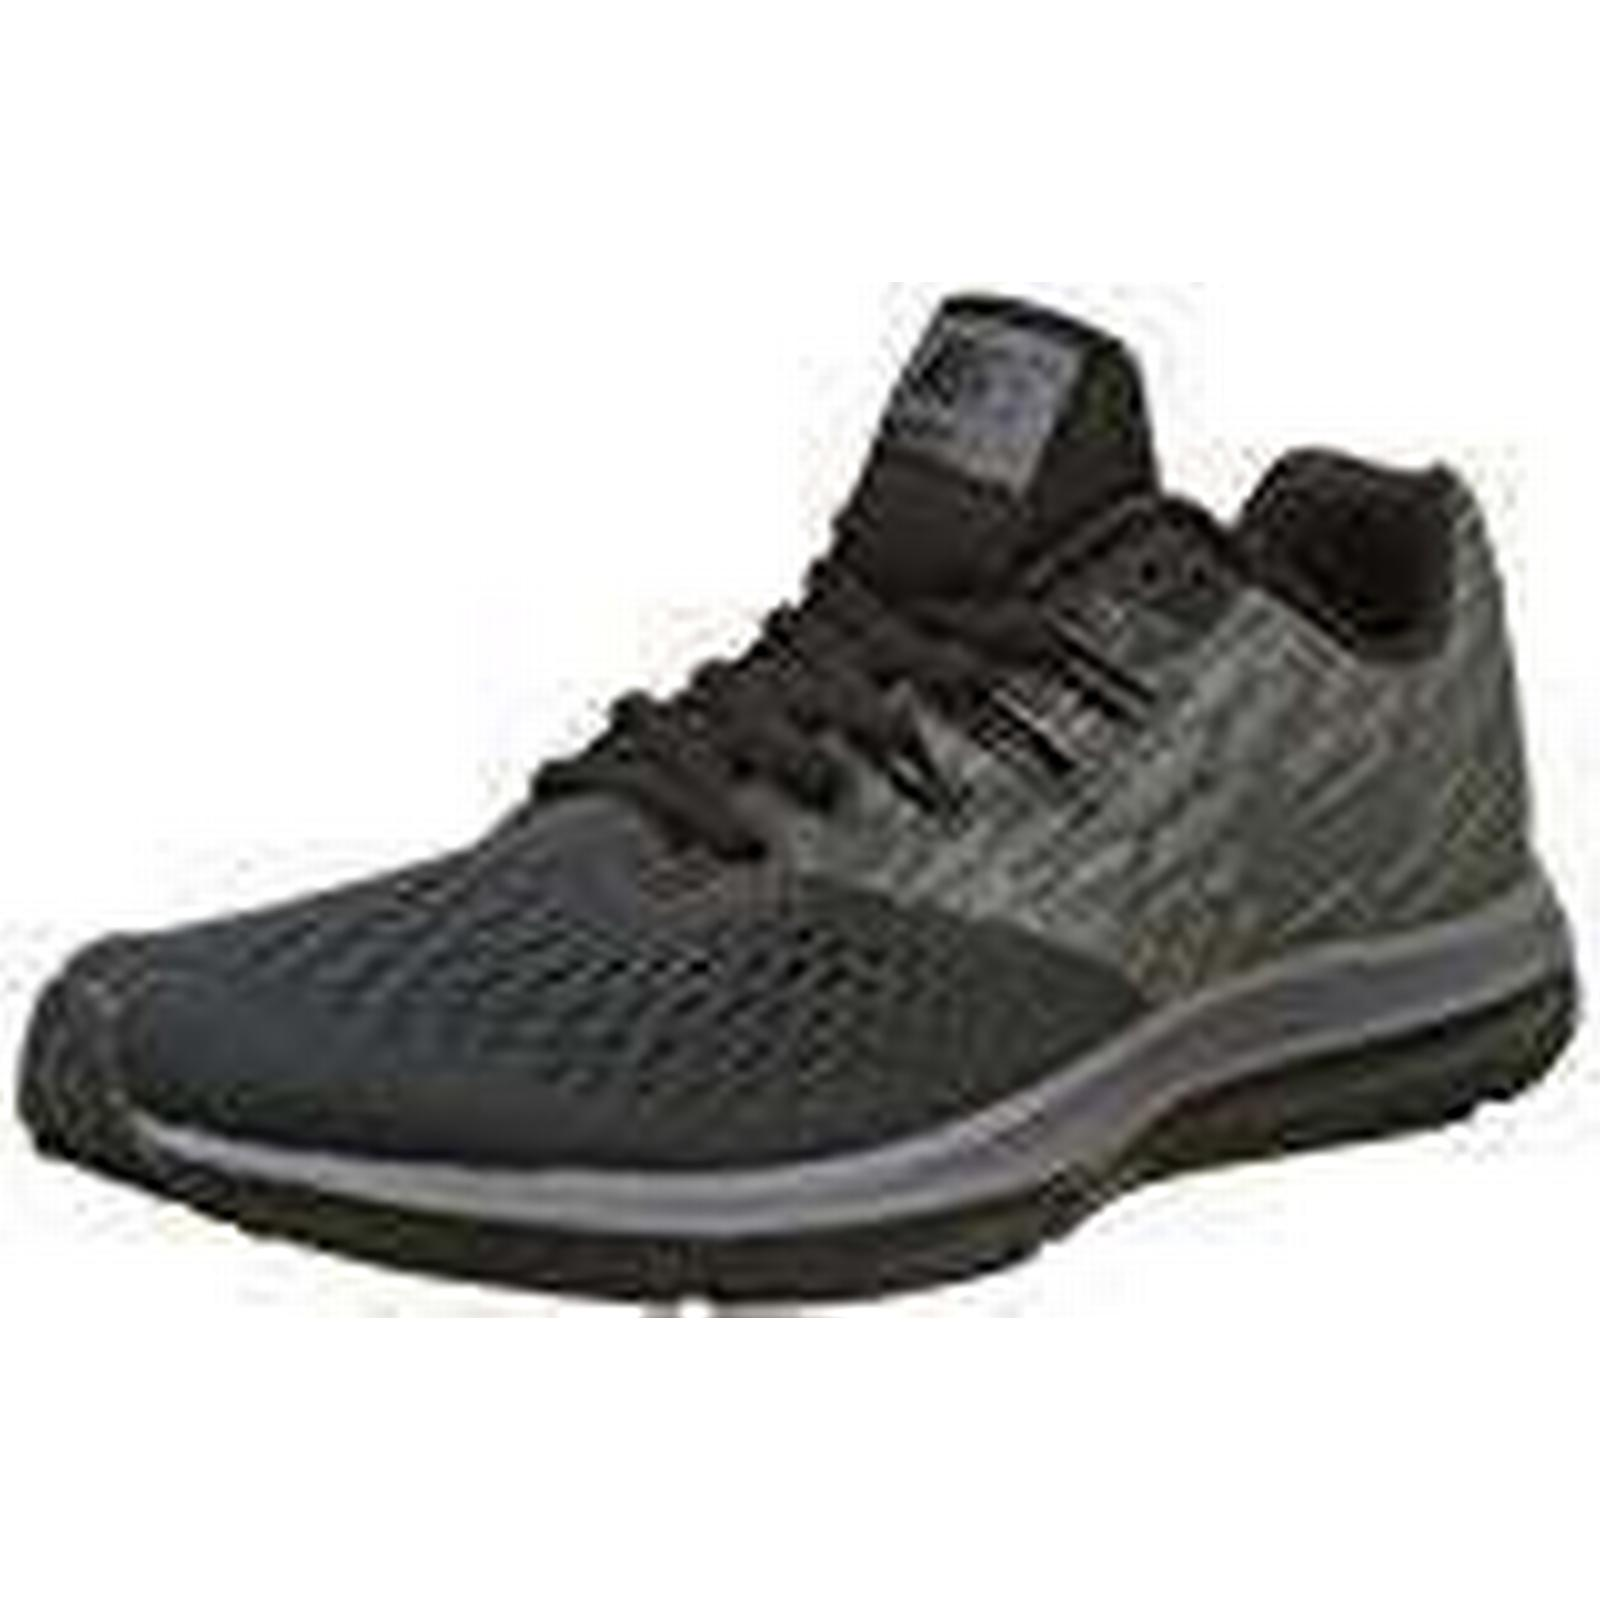 Nike Zoom Winflo 4, Men's Grey), Running Shoes, Black (Anthracite/Black/Dark Grey), Men's 7 UK (41 EU) 1dafc2